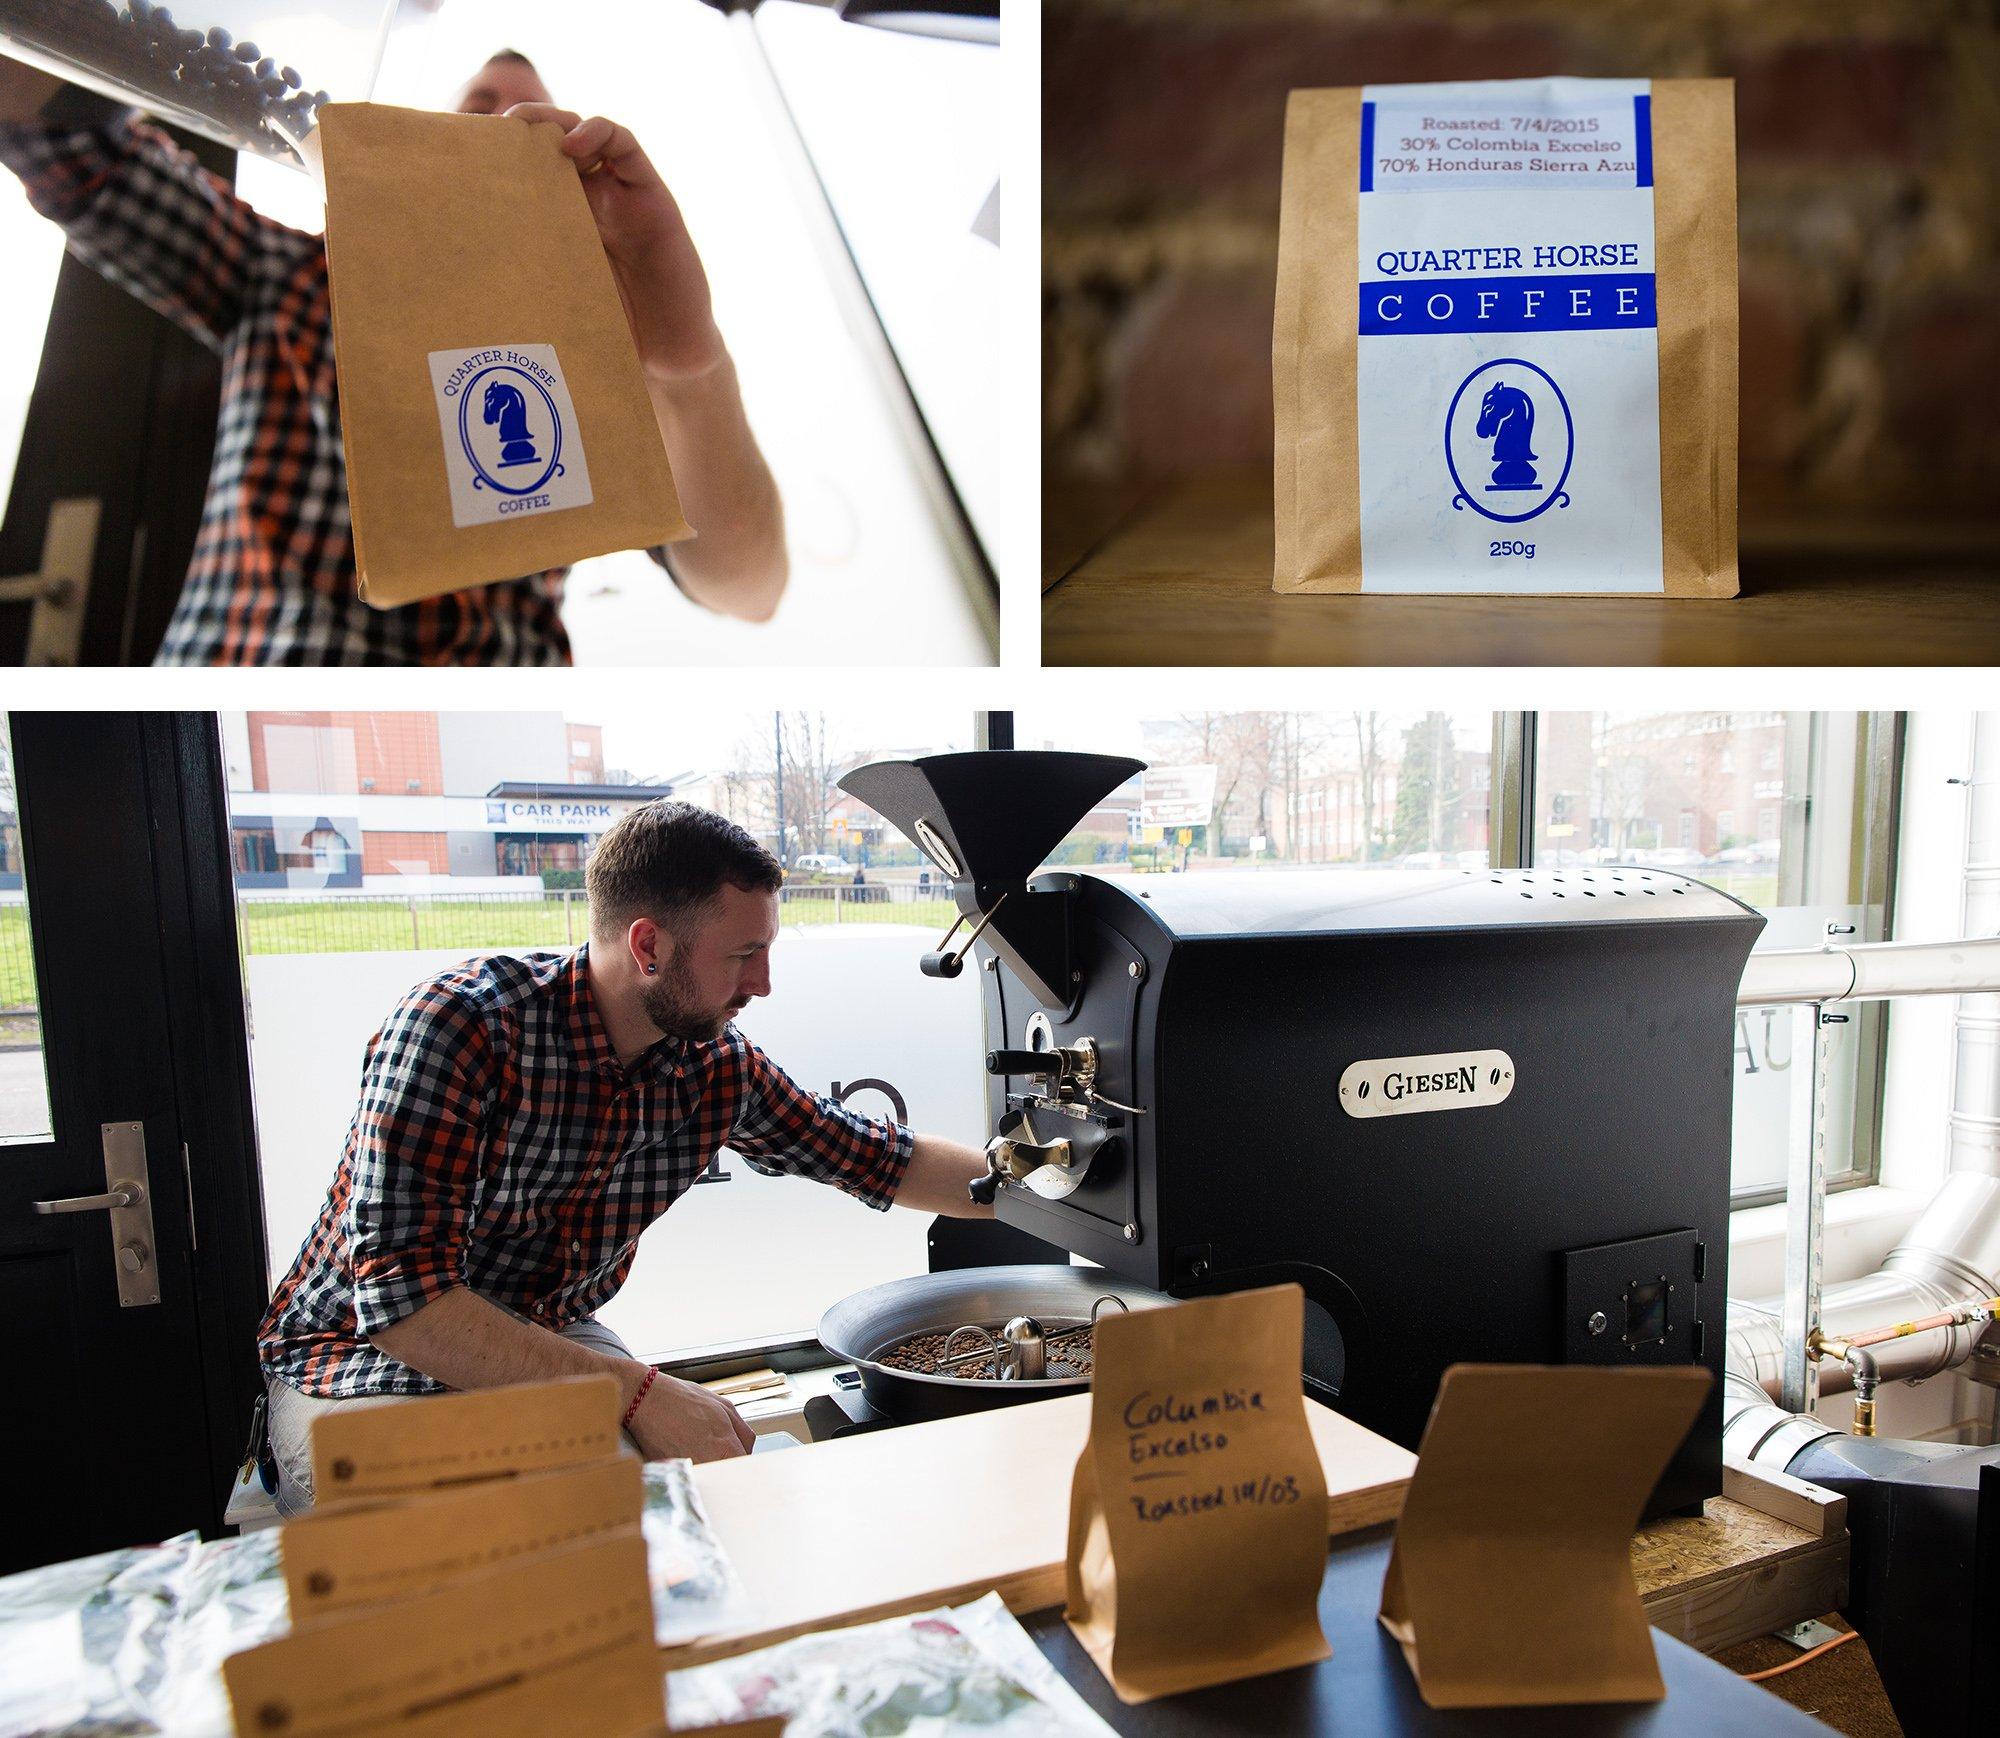 Quarter_Horse_Coffee_Shipping.jpg